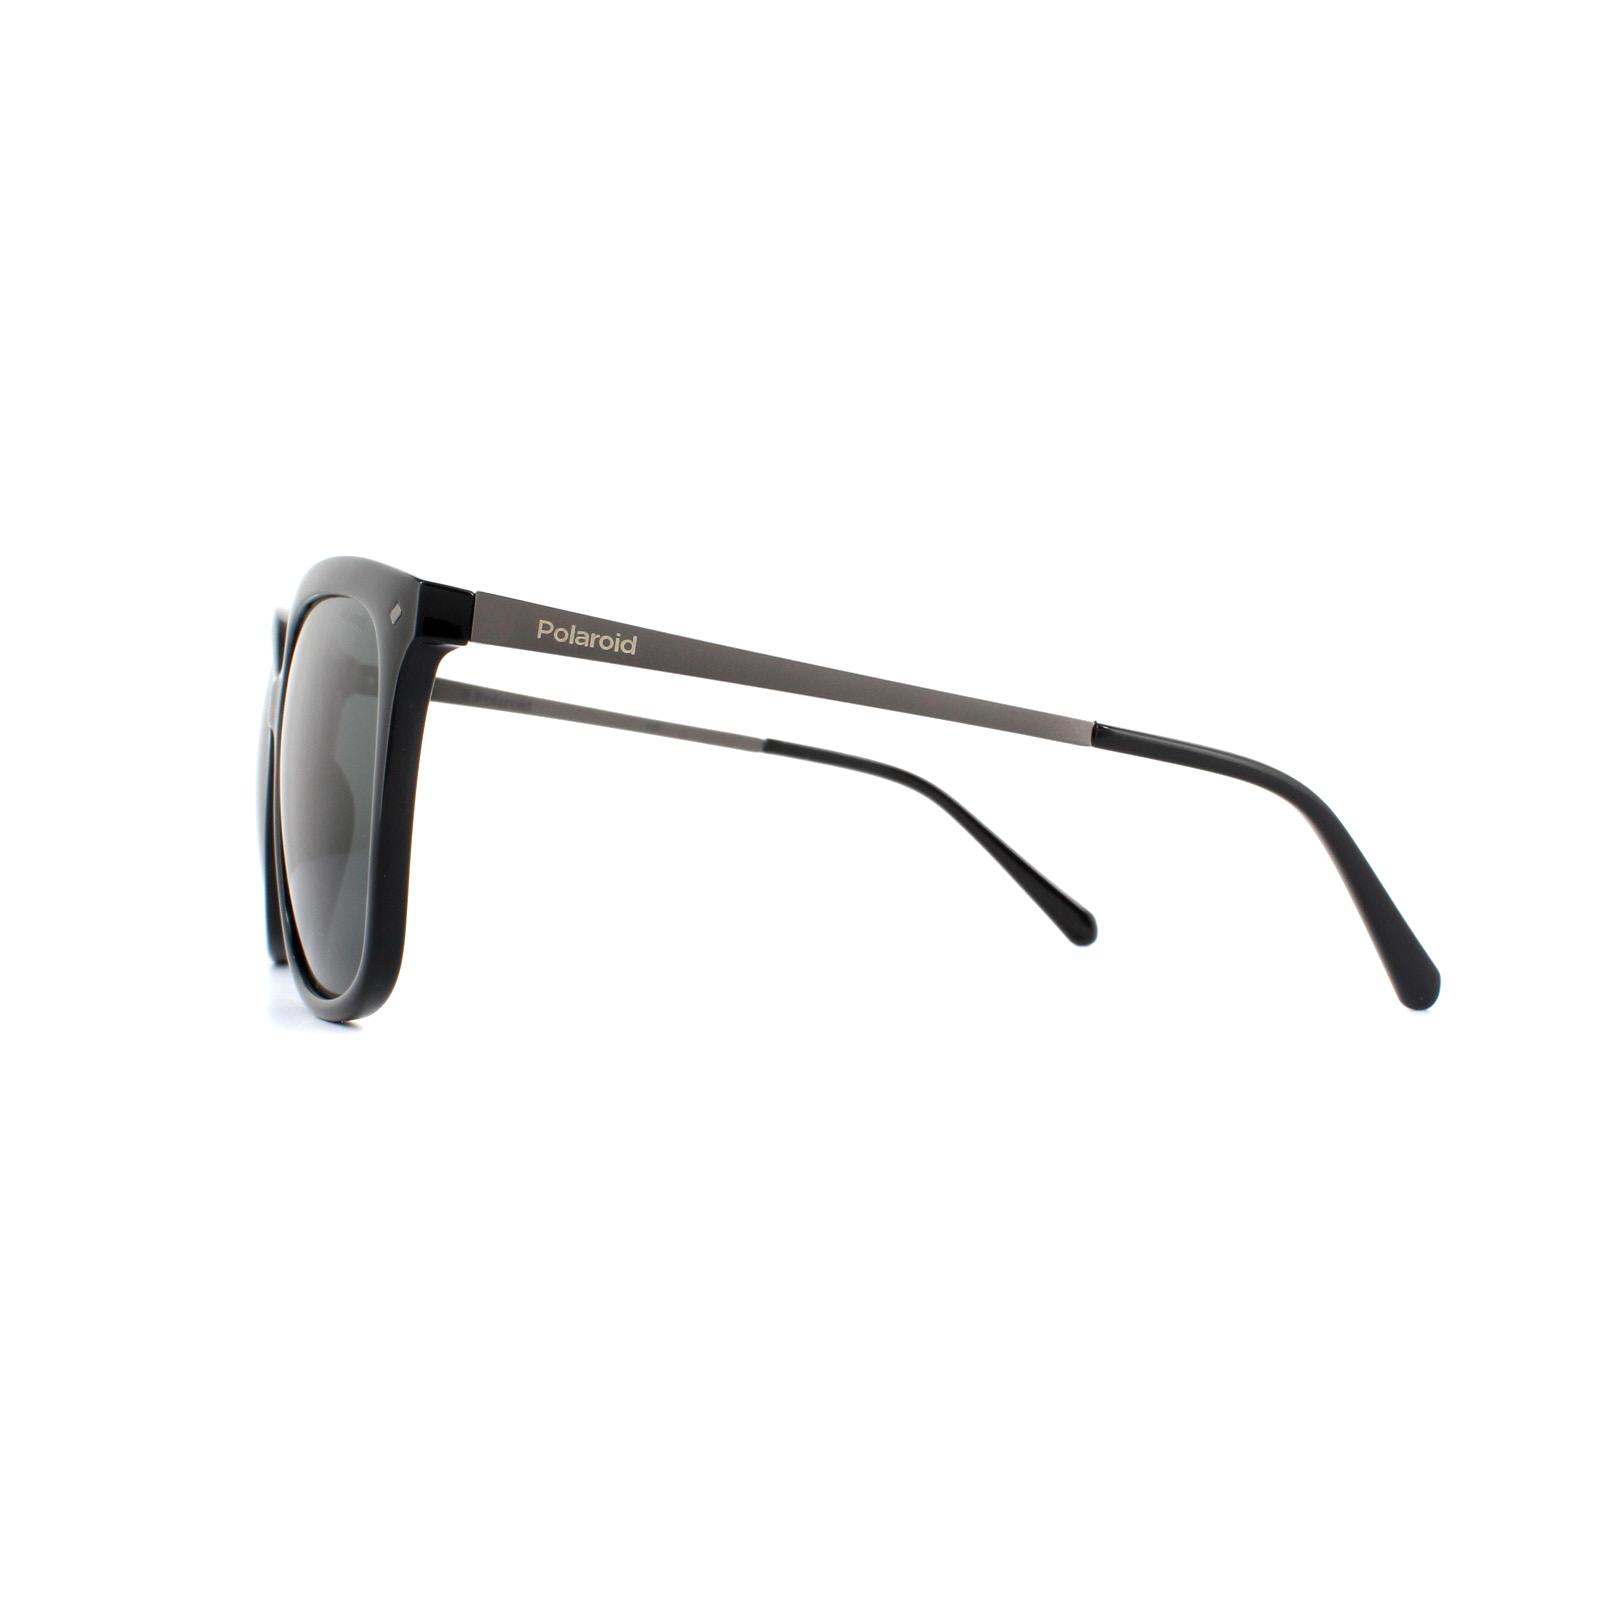 69cbe38fd7 Sentinel Polaroid Sunglasses PLD 4043 S CVS Y2 Black Grey Polarized